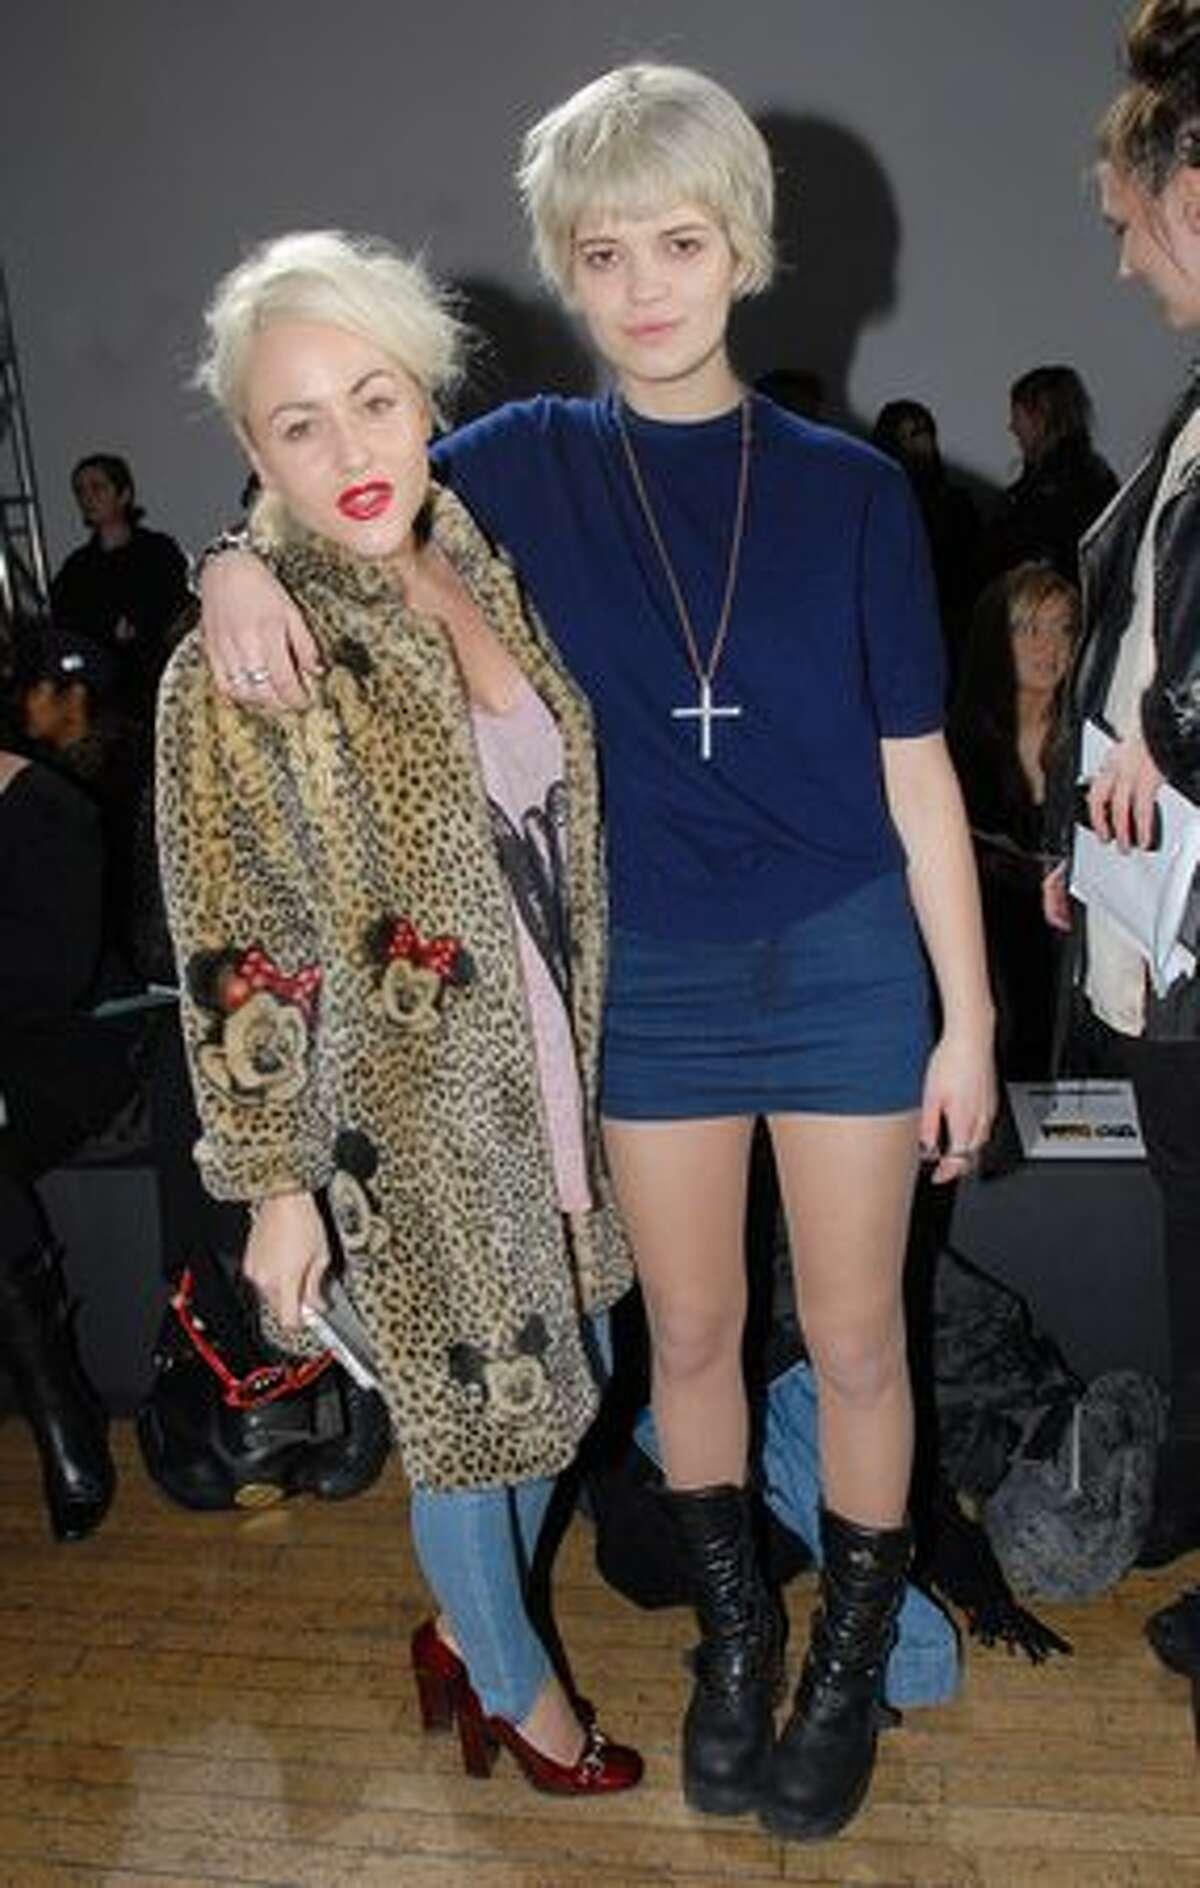 Jaime Winstone (L) and Pixie Geldof attend the Felder & Felder catwalk show as part of London Fashion Week in London, England.